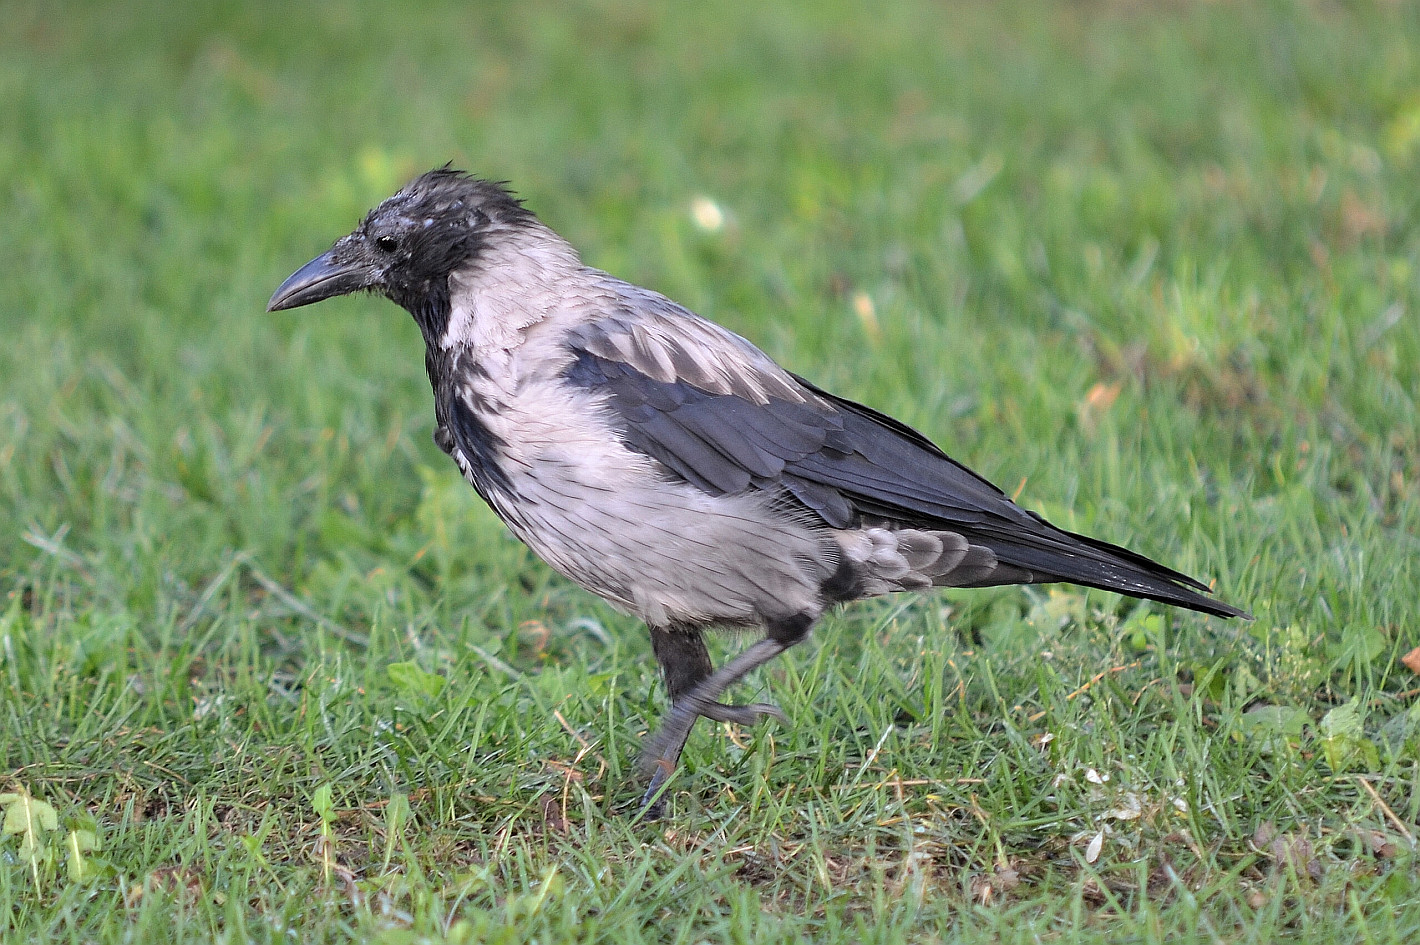 Nebelkrähe, Jungvogel, (Corvus cornix), hooded crow, Corneja